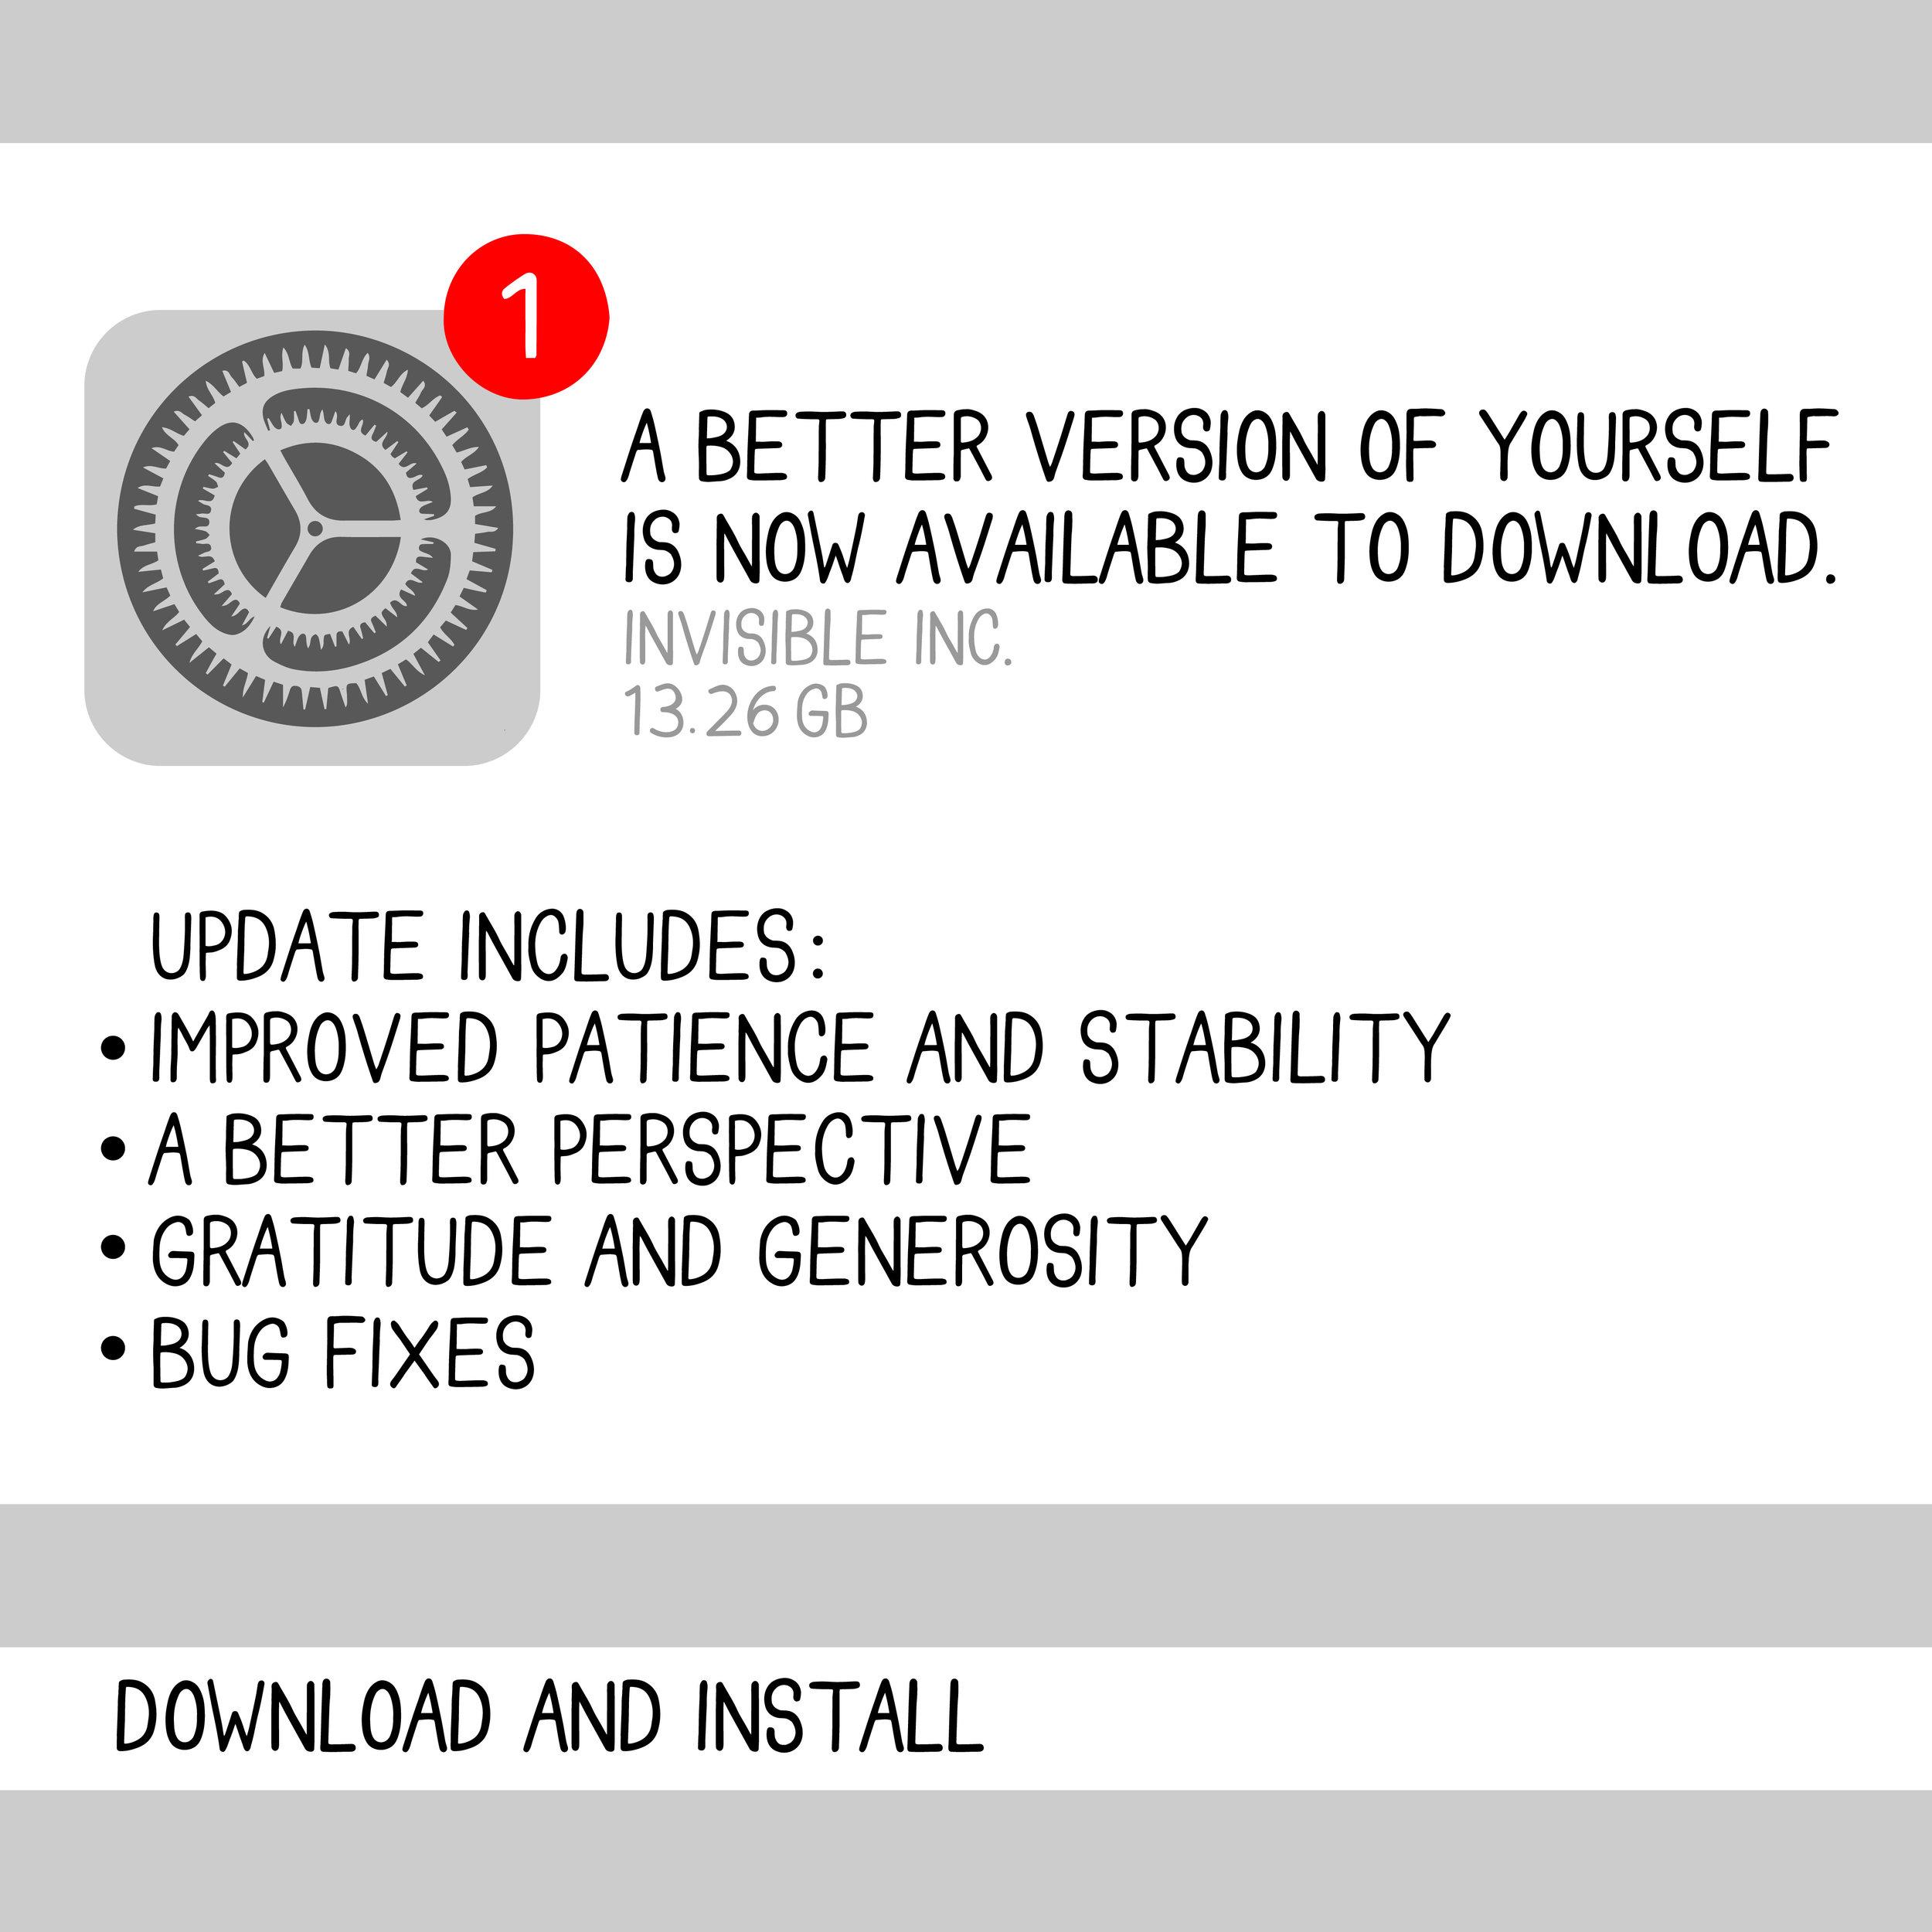 download-01.jpg